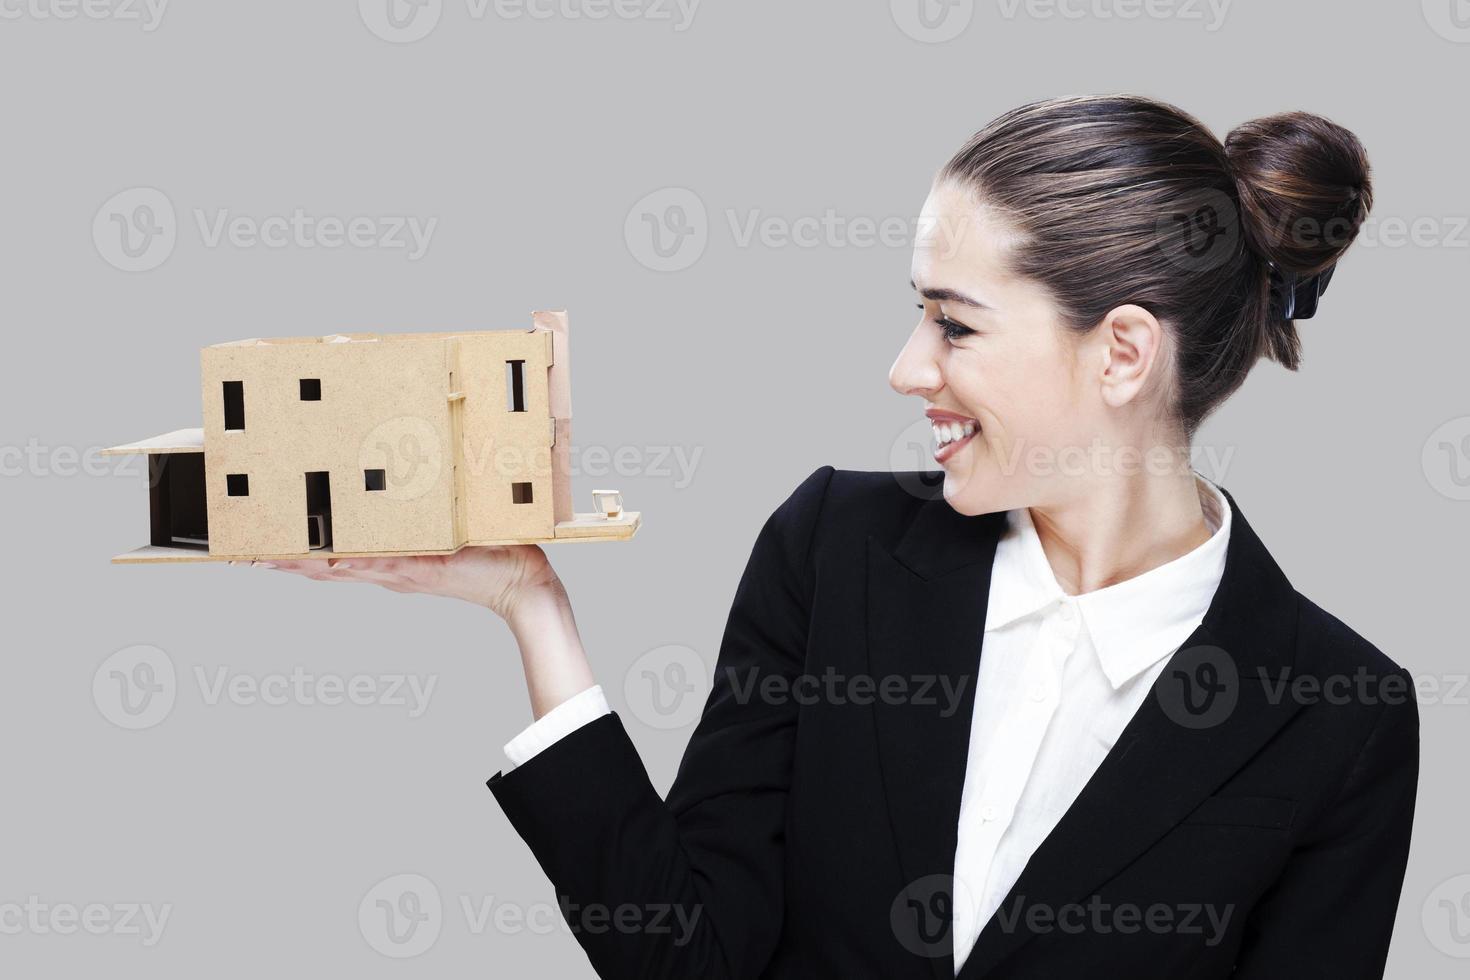 Female business agent holding house model photo